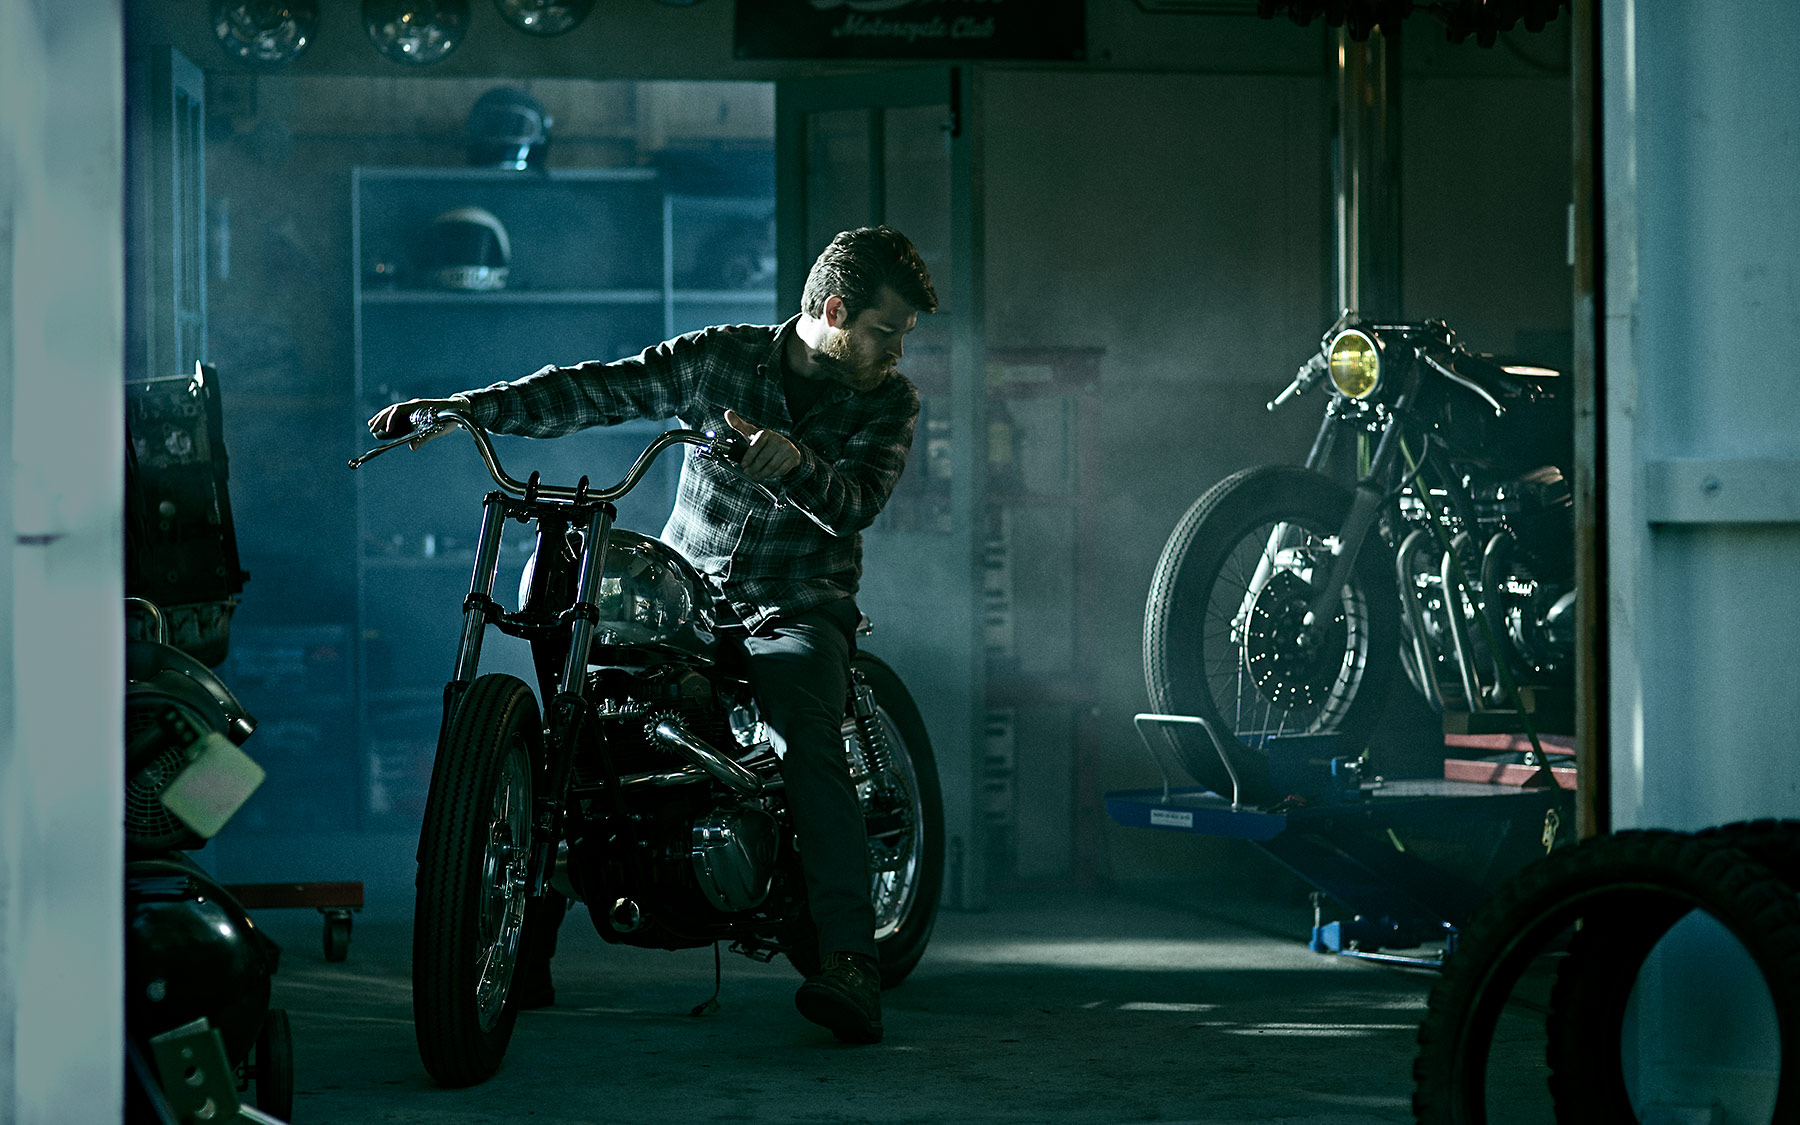 Sam at Inglorious Motorcycles